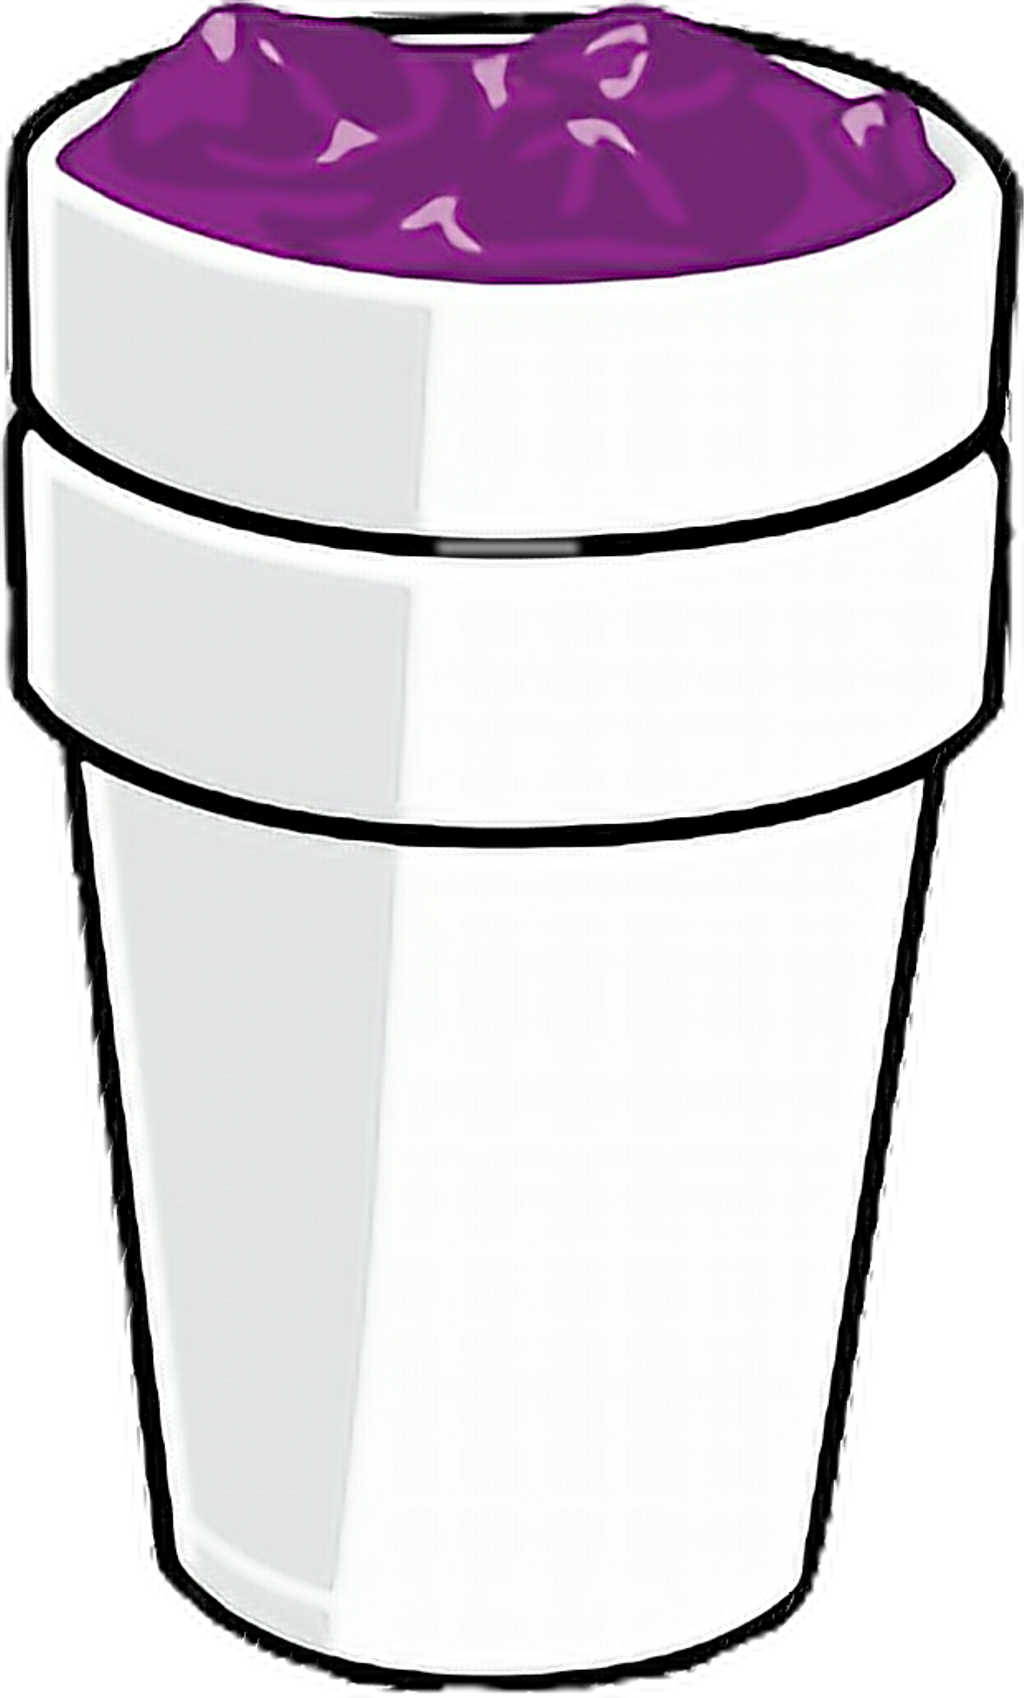 Purple drank Portable Network Graphics Clip art Codeine.